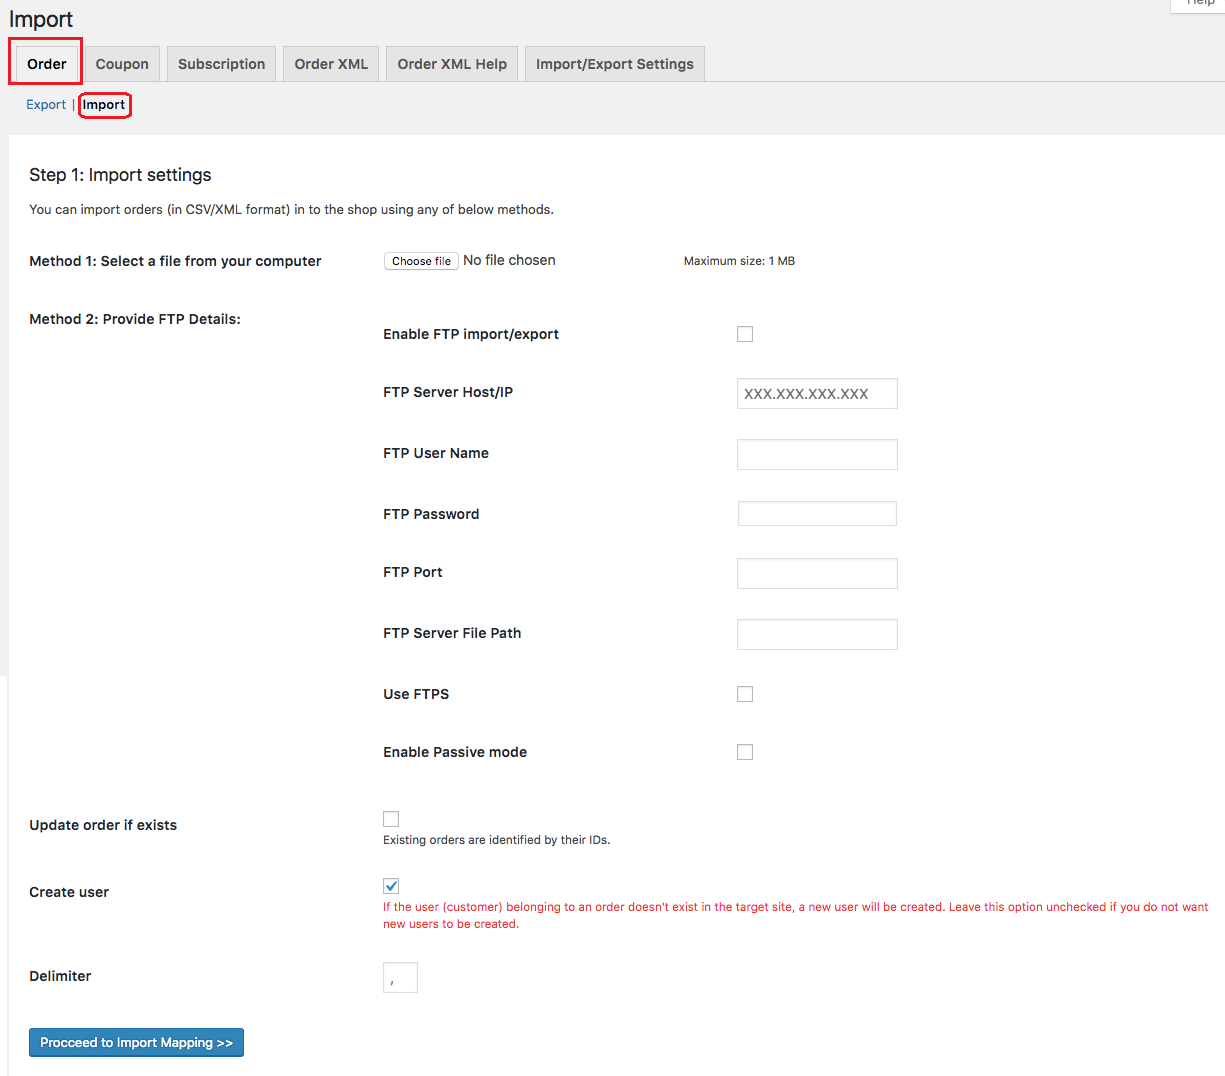 Order import settings